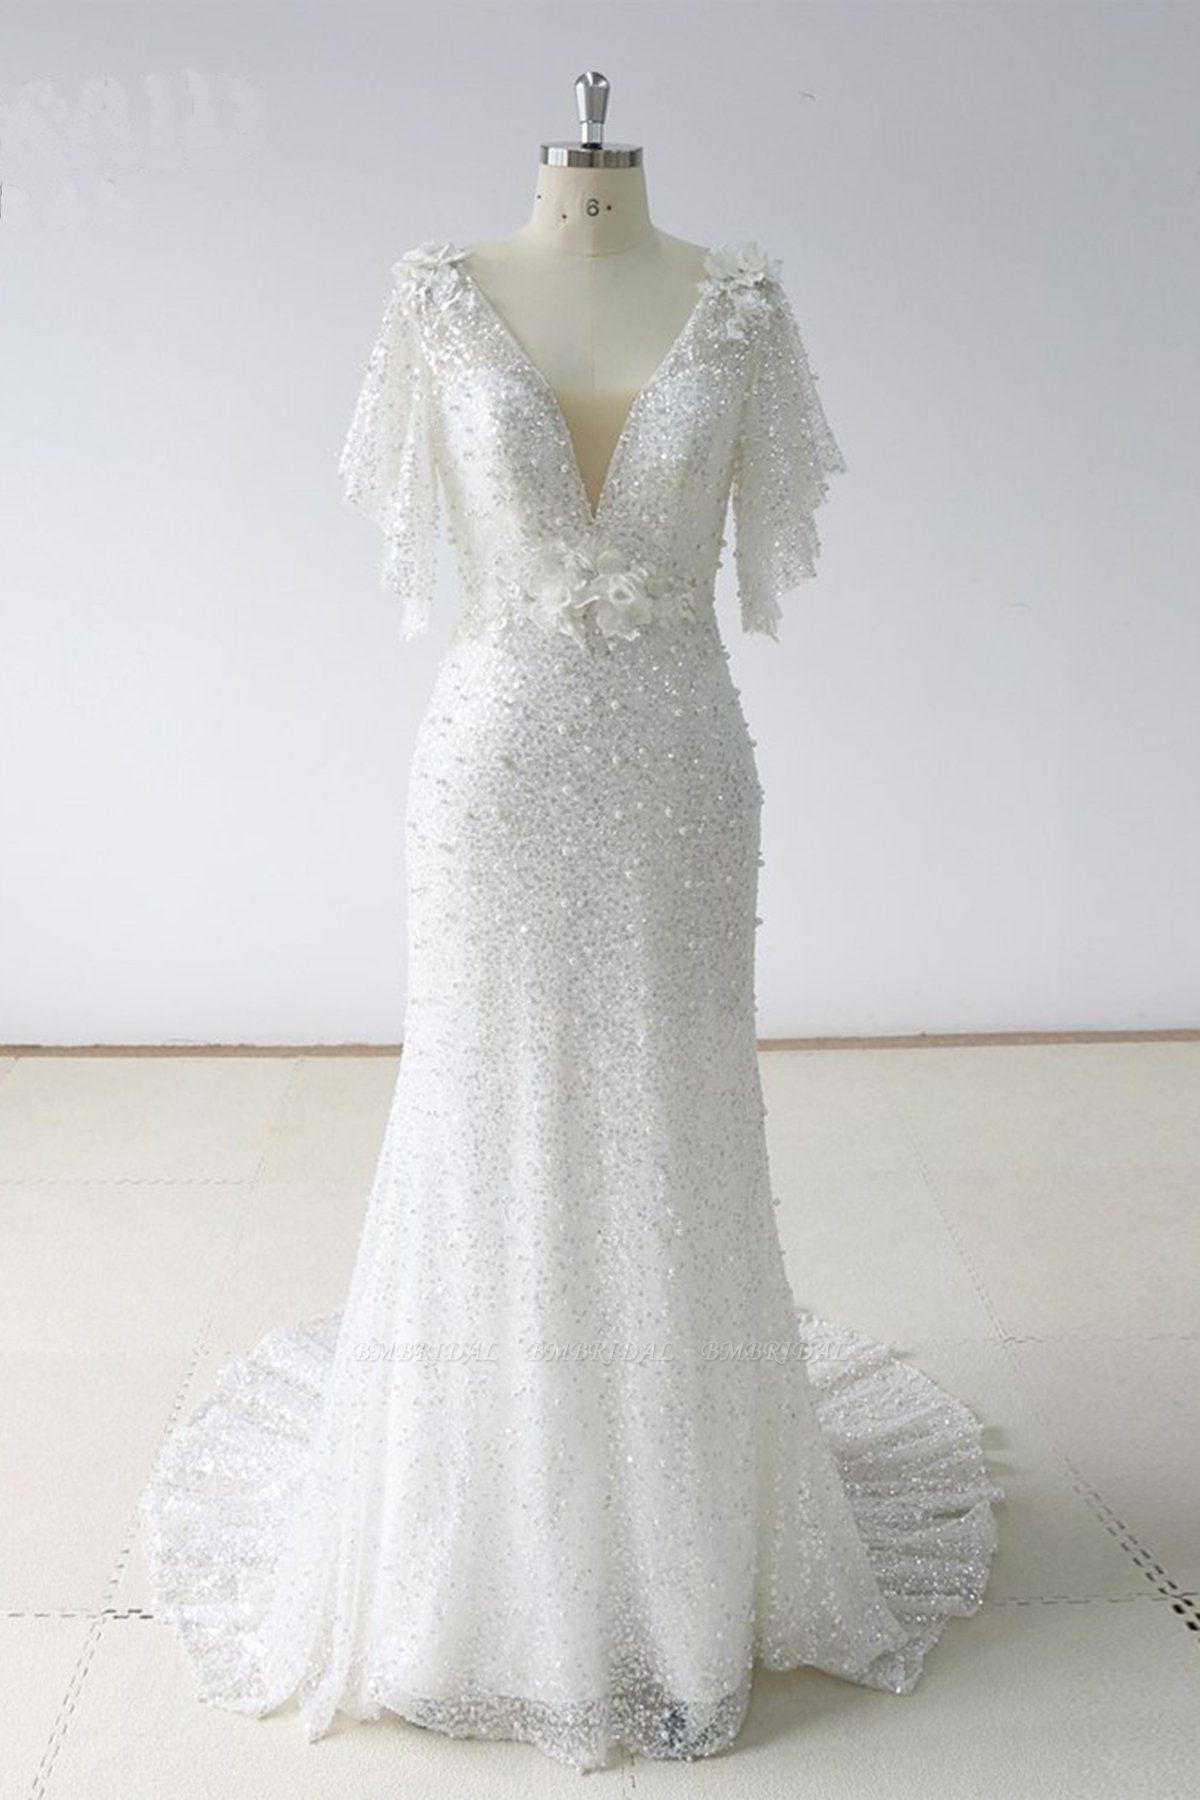 BMbridal Elegant Stunning Sequins White Tulle Wedding Dress Sweep Train Mermaid Short Sleeve Bridal Gowns On Sale